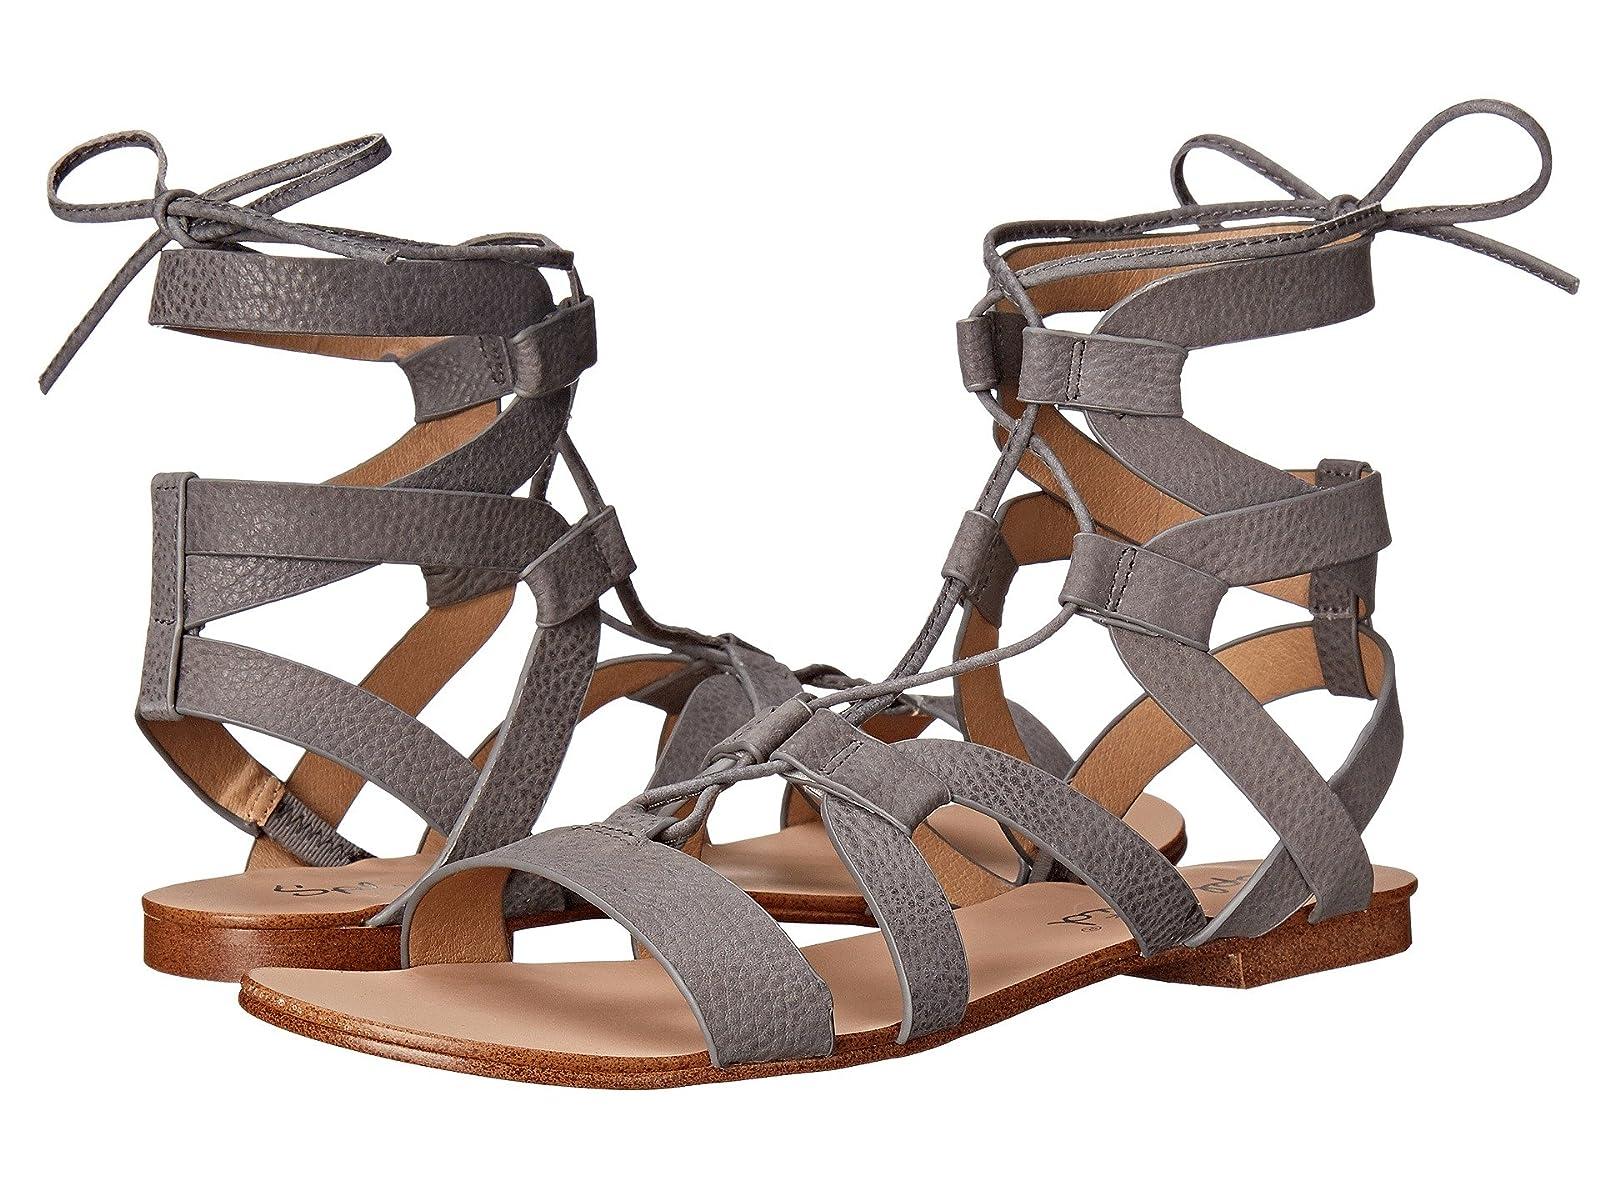 Splendid CameronCheap and distinctive eye-catching shoes